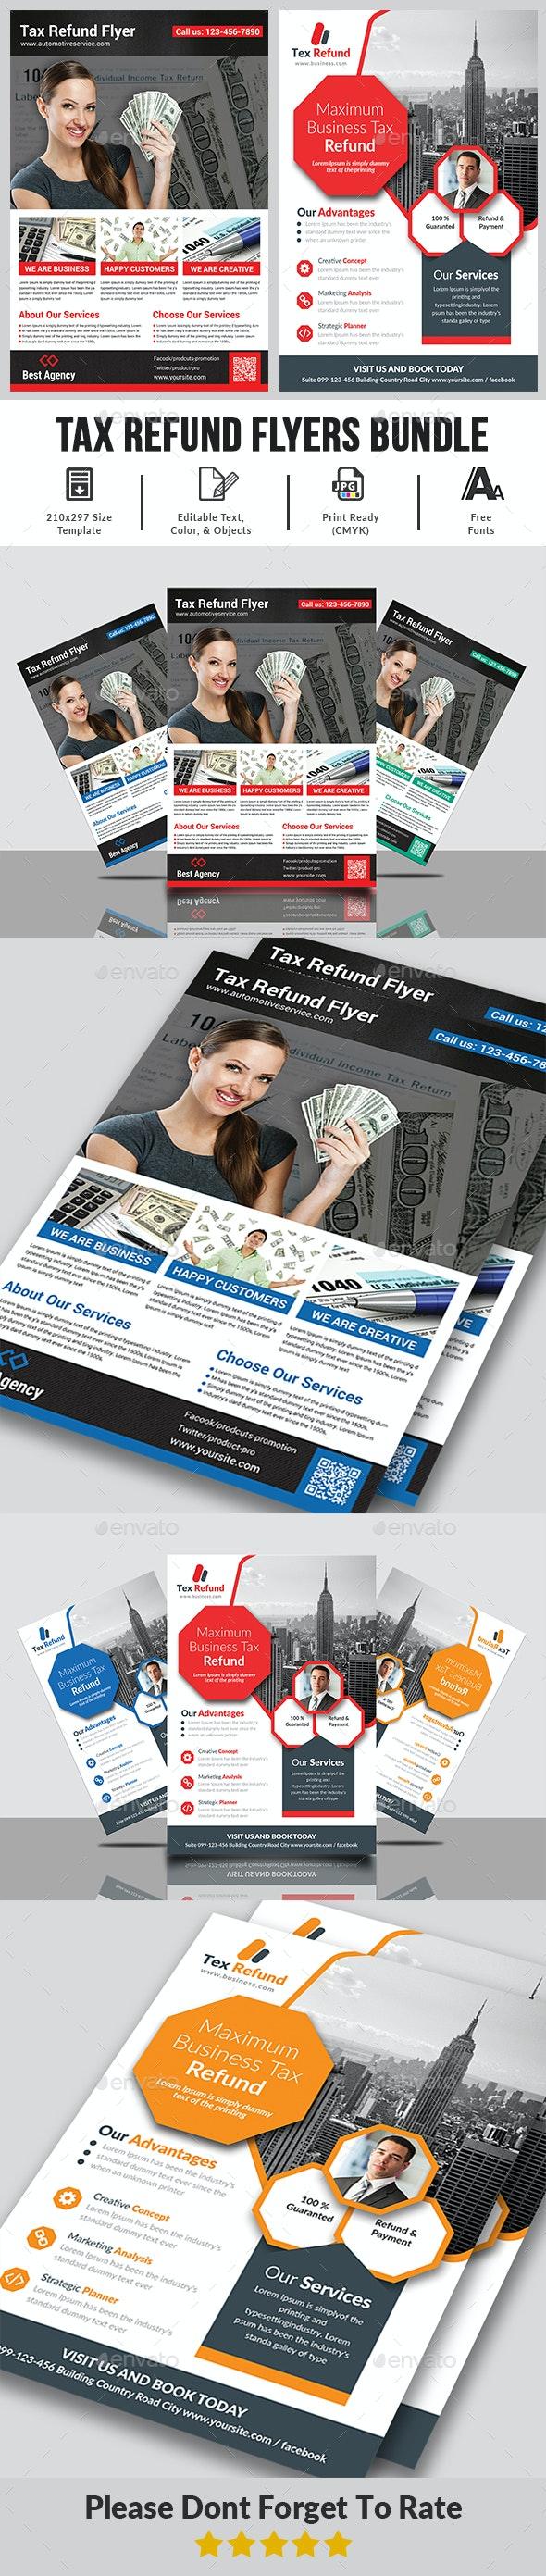 Business Tax Refund Flyer Bundle - Corporate Flyers